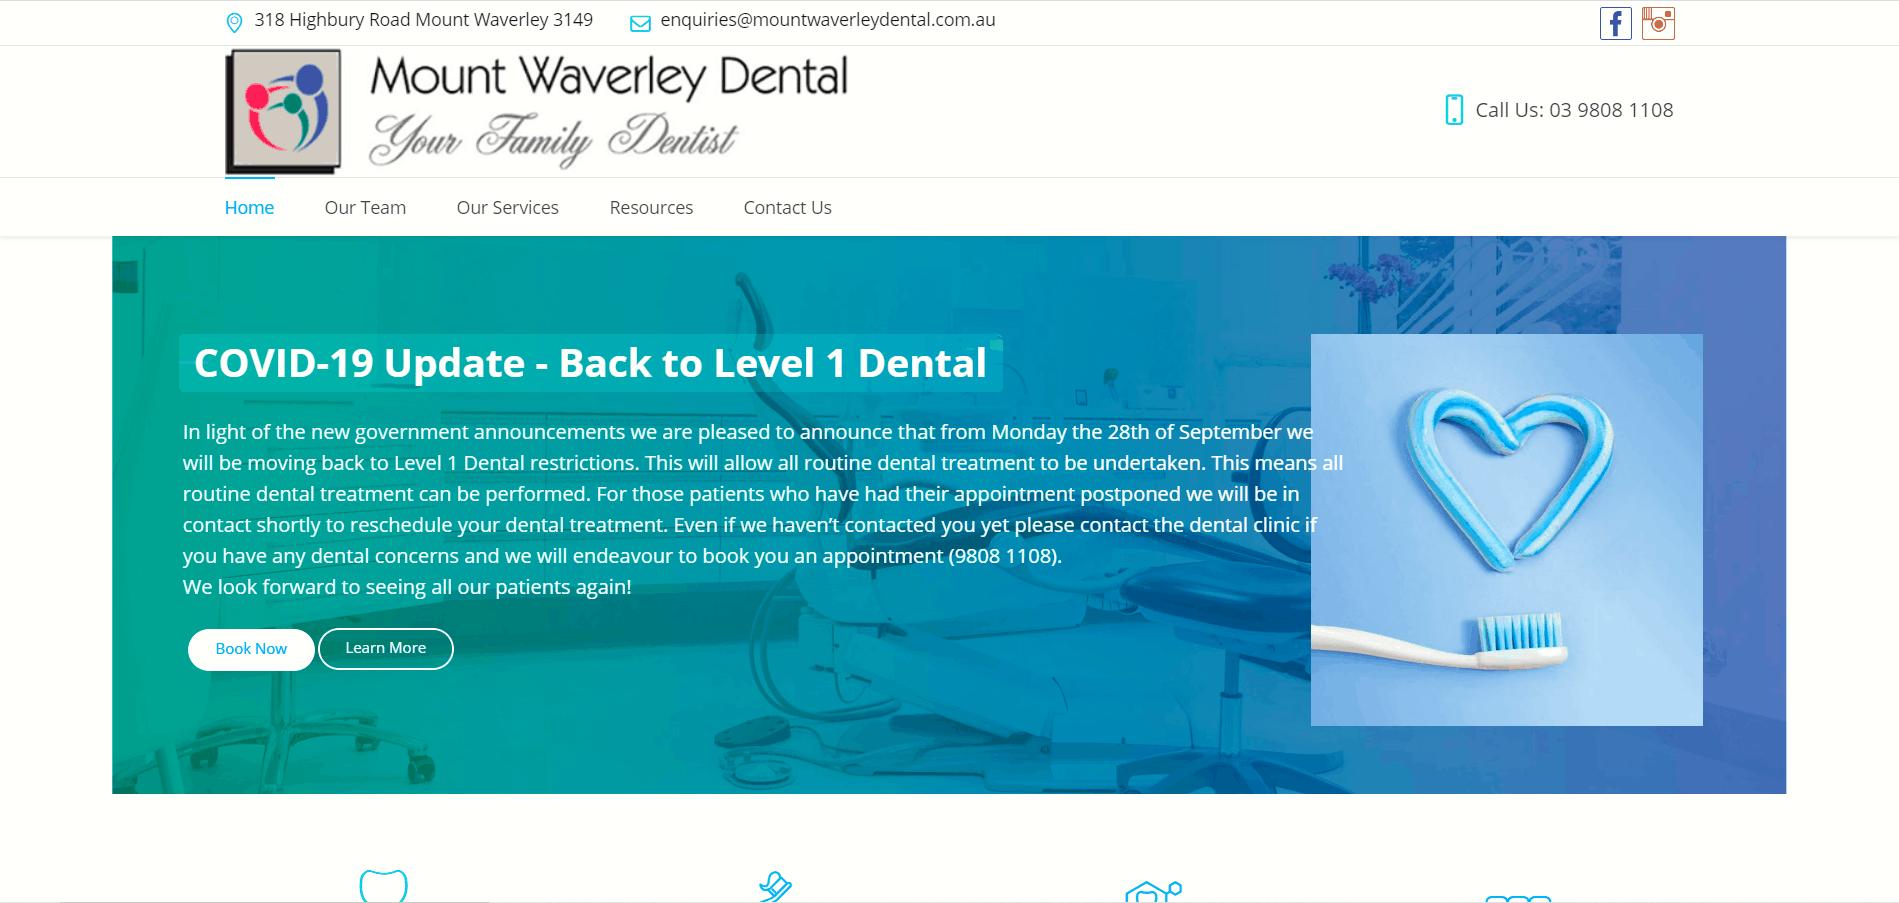 Mount Waverley Dental